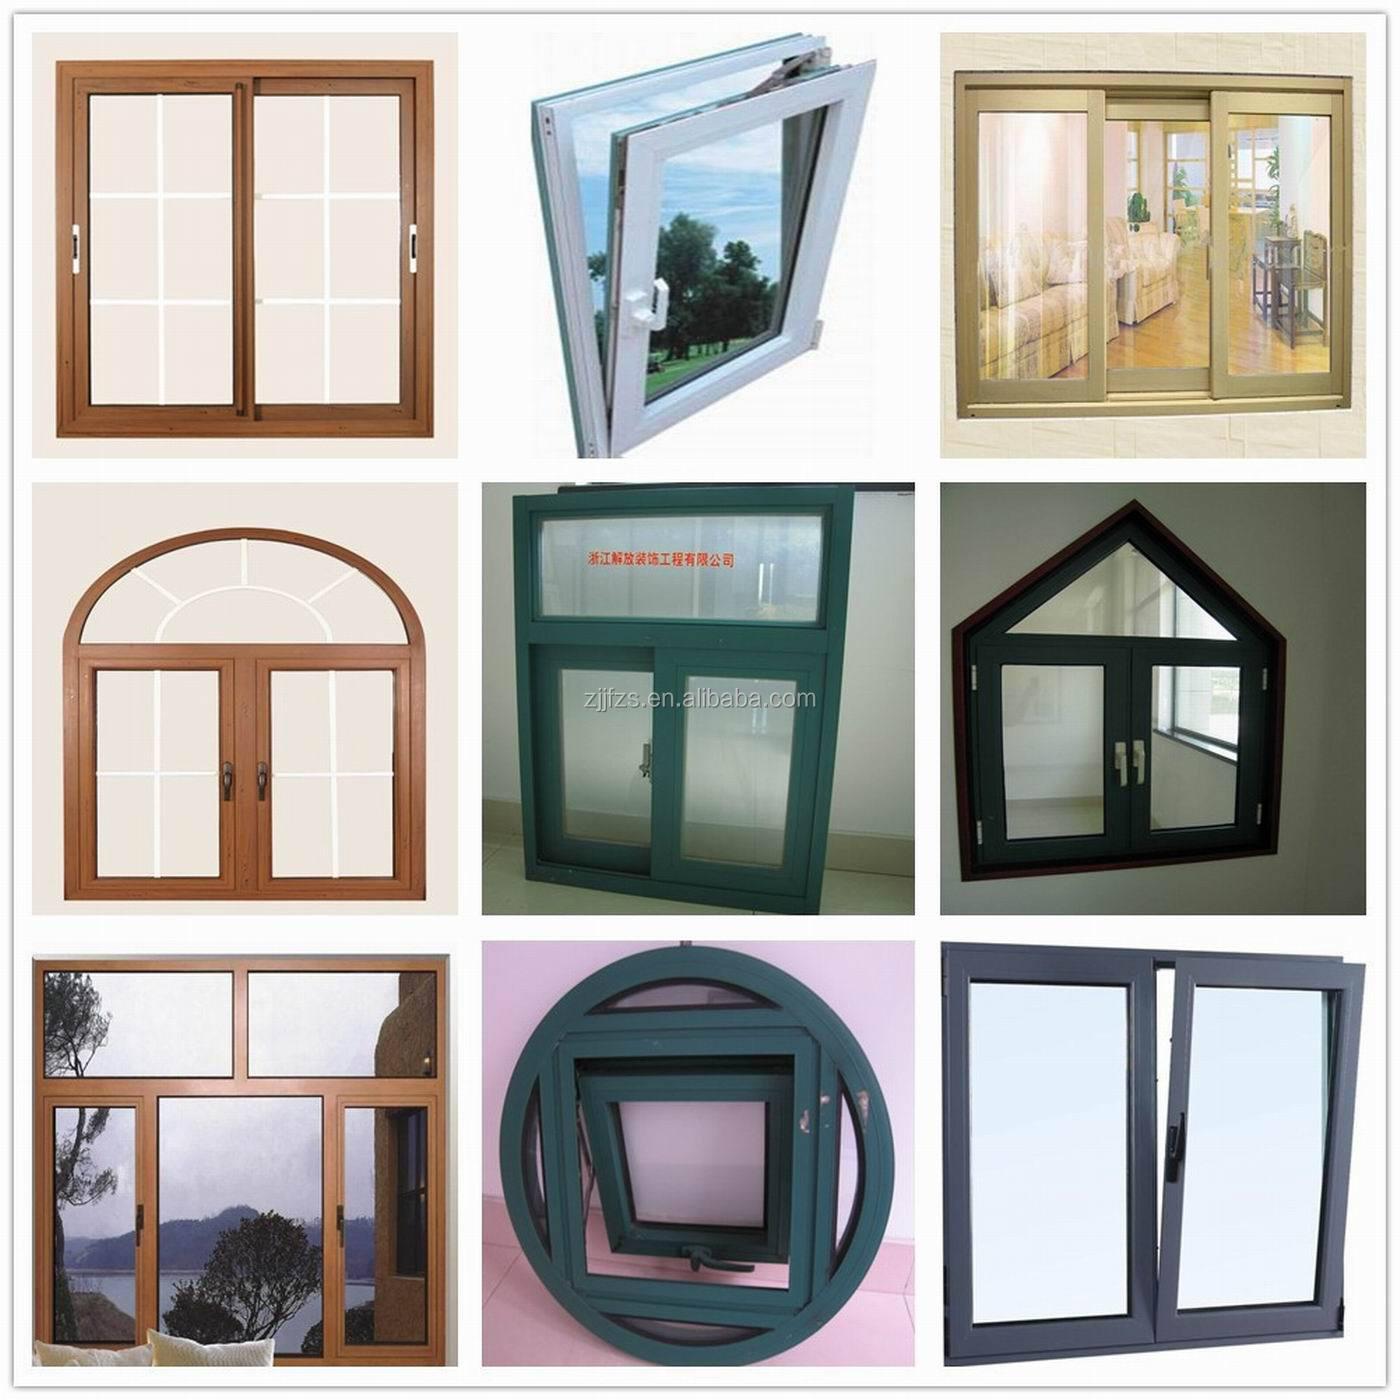 Ventanas correderas de aluminio con doble vidrio ventana for Ventanas de aluminio para cocina